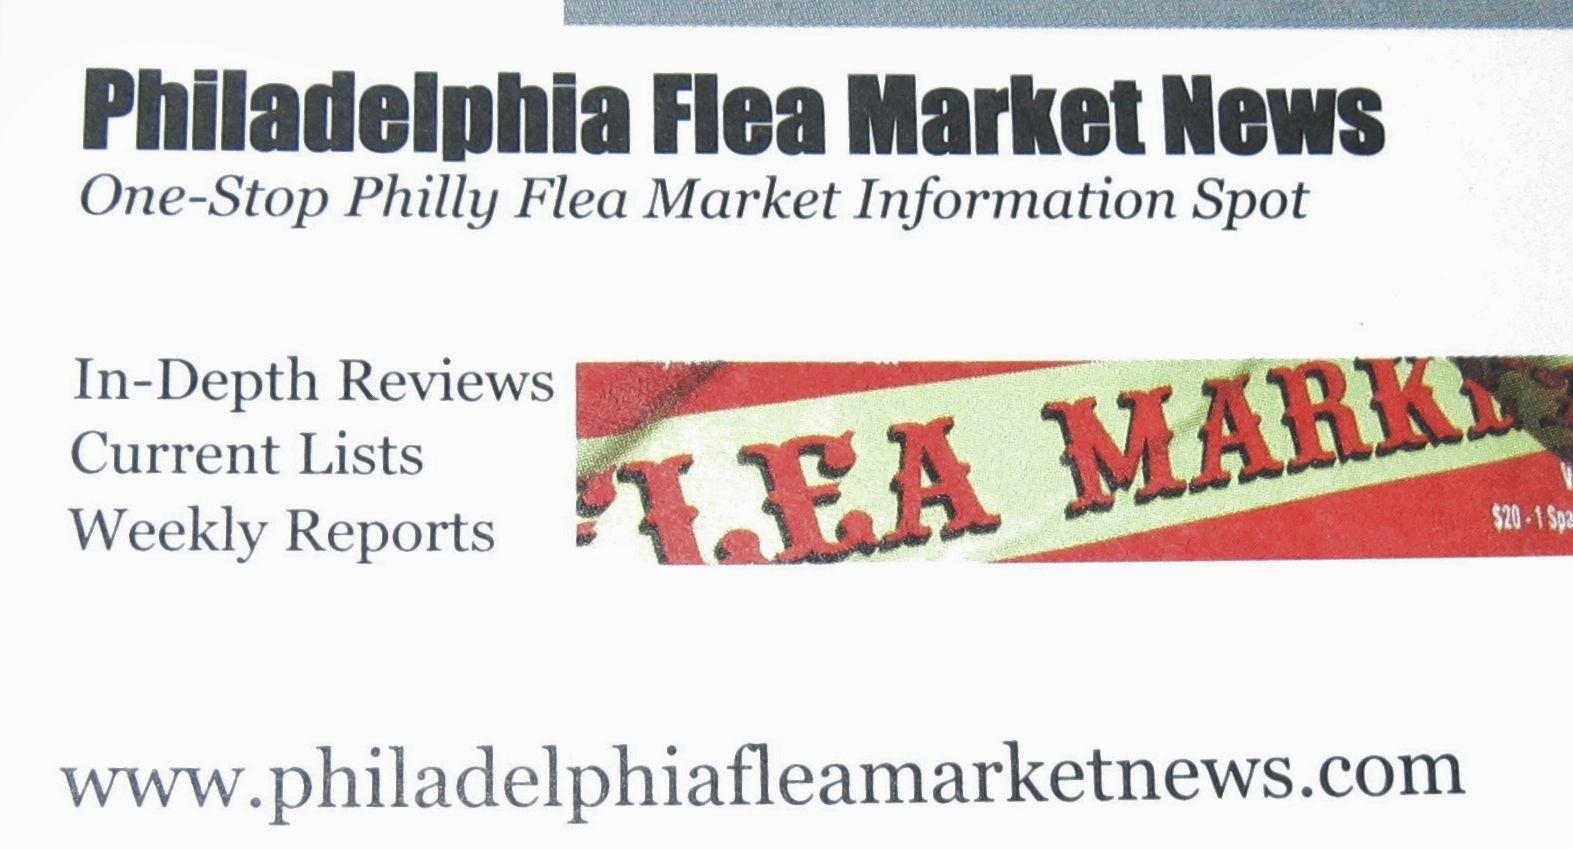 Philadelphia Flea Market News business card. | Flea Market Pictures ...